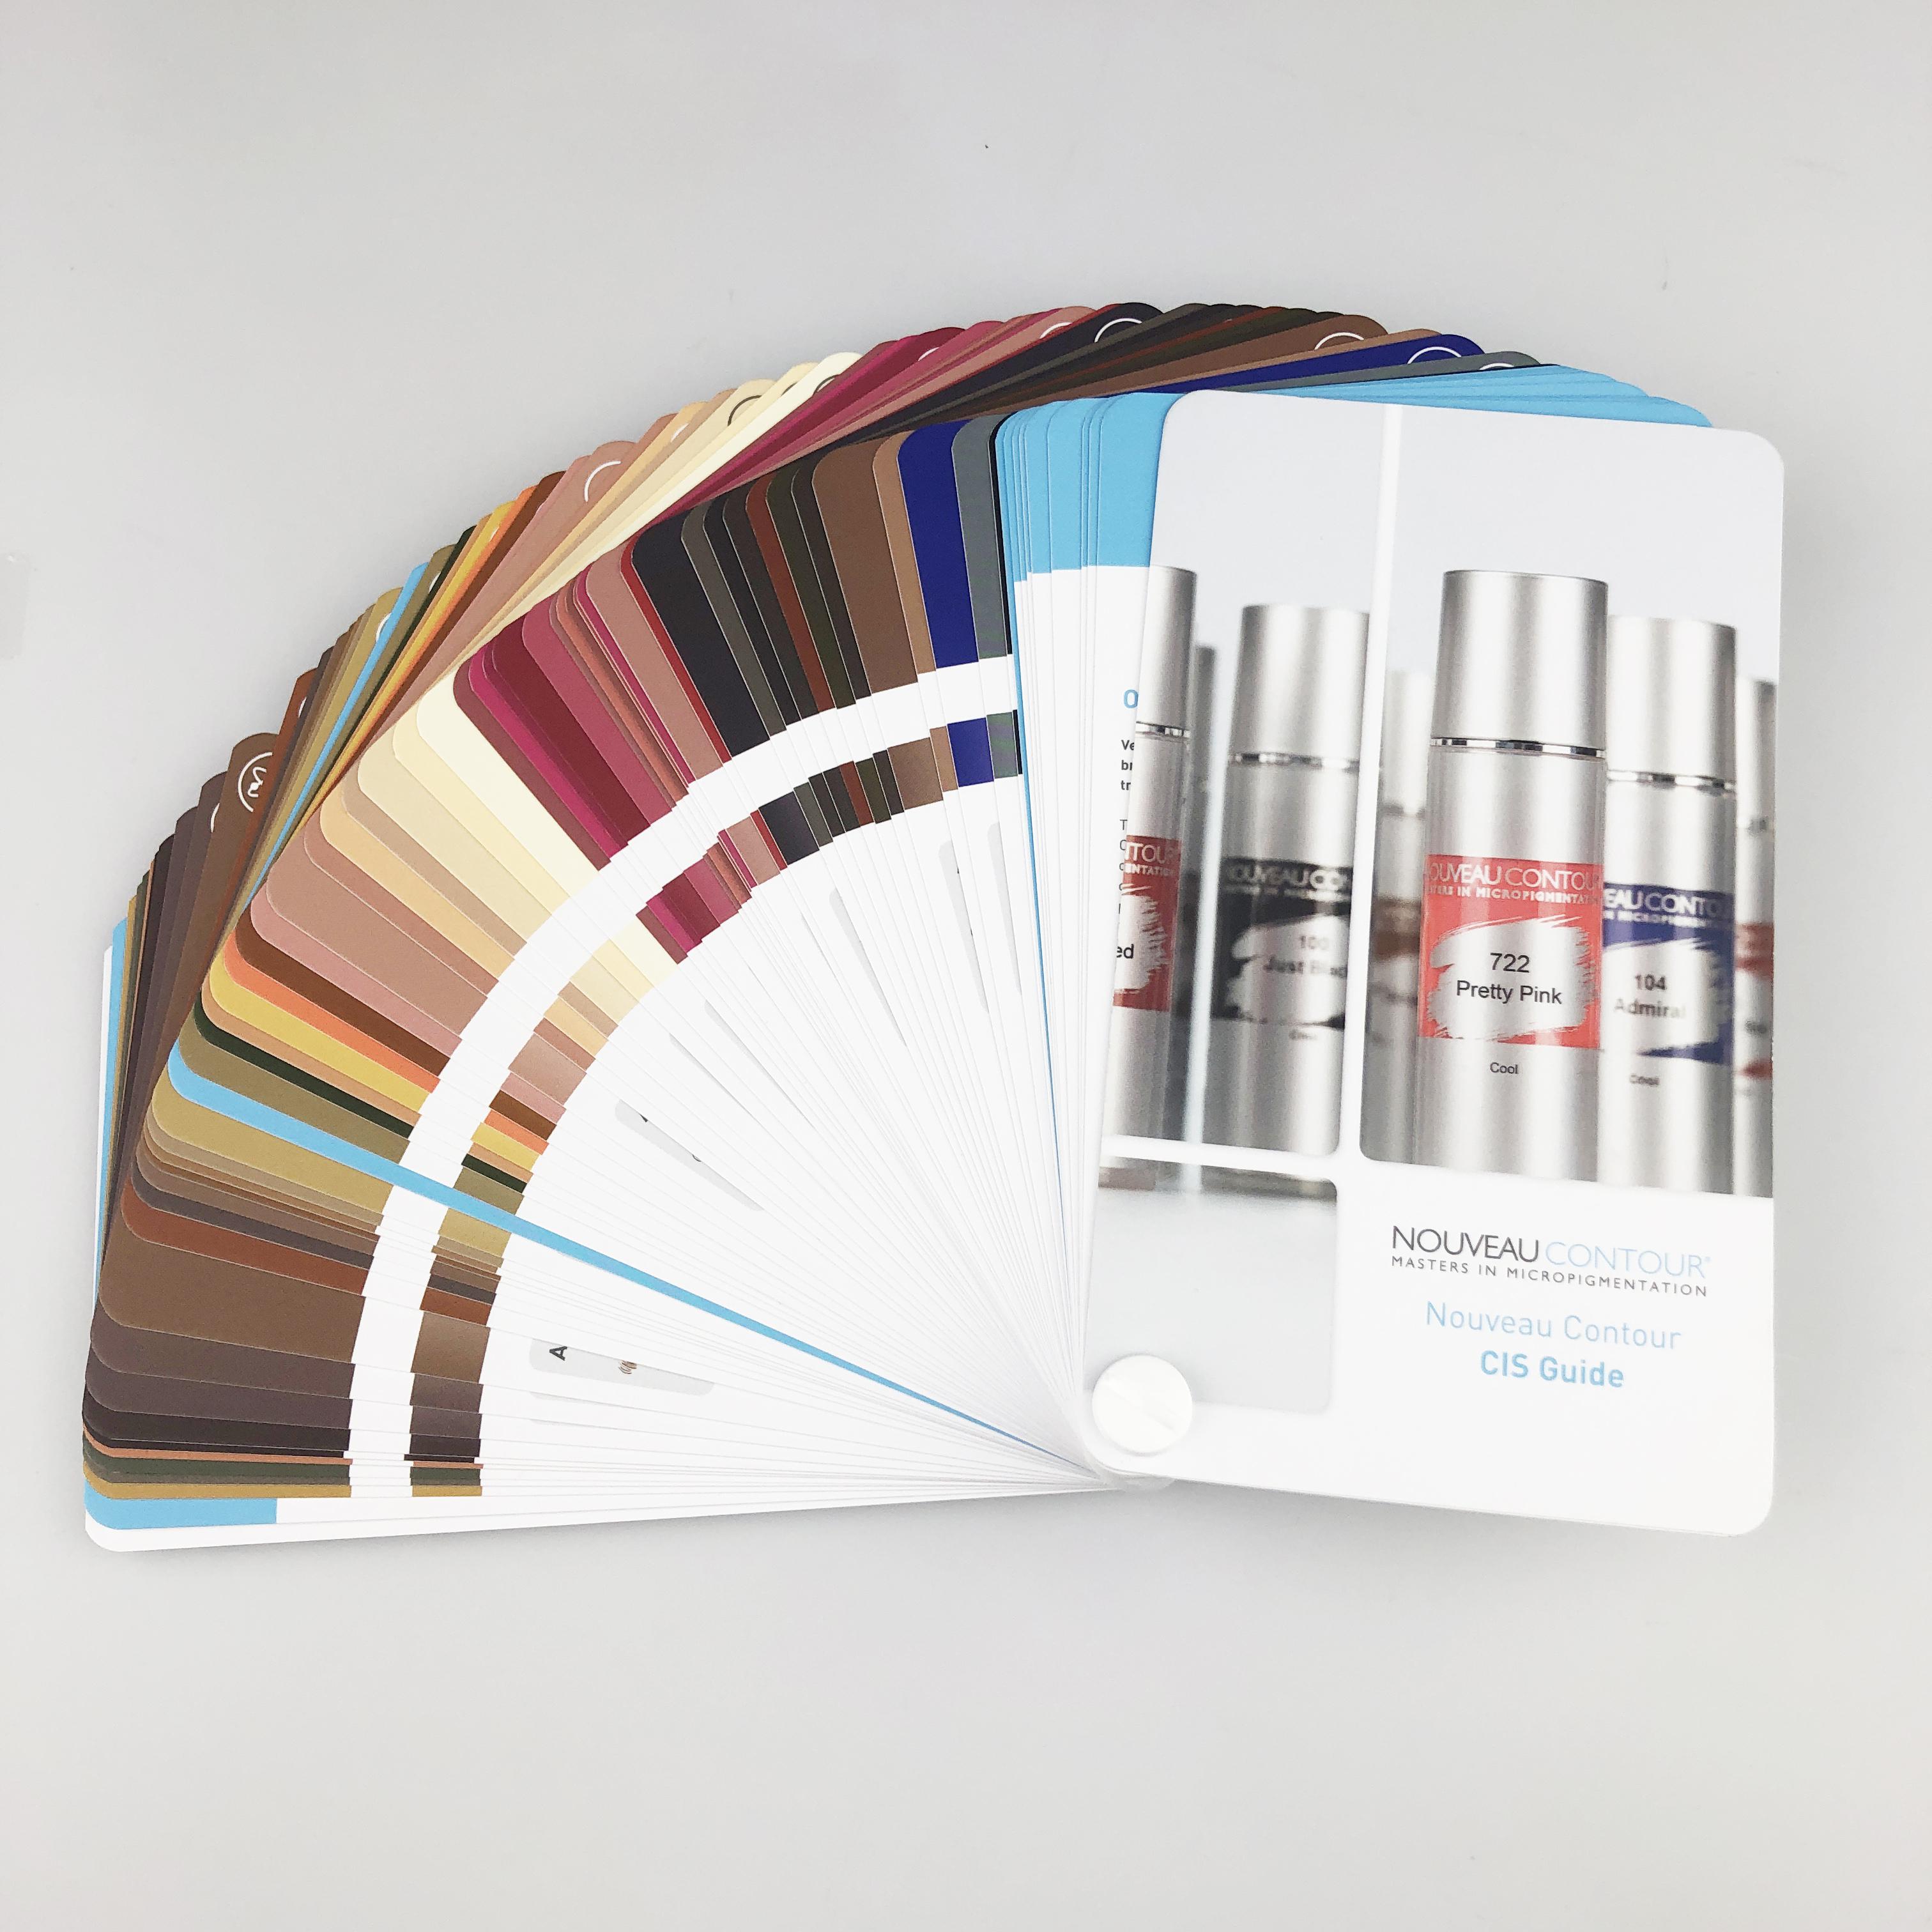 Färgkort CIS för Nouveau Contours pigment